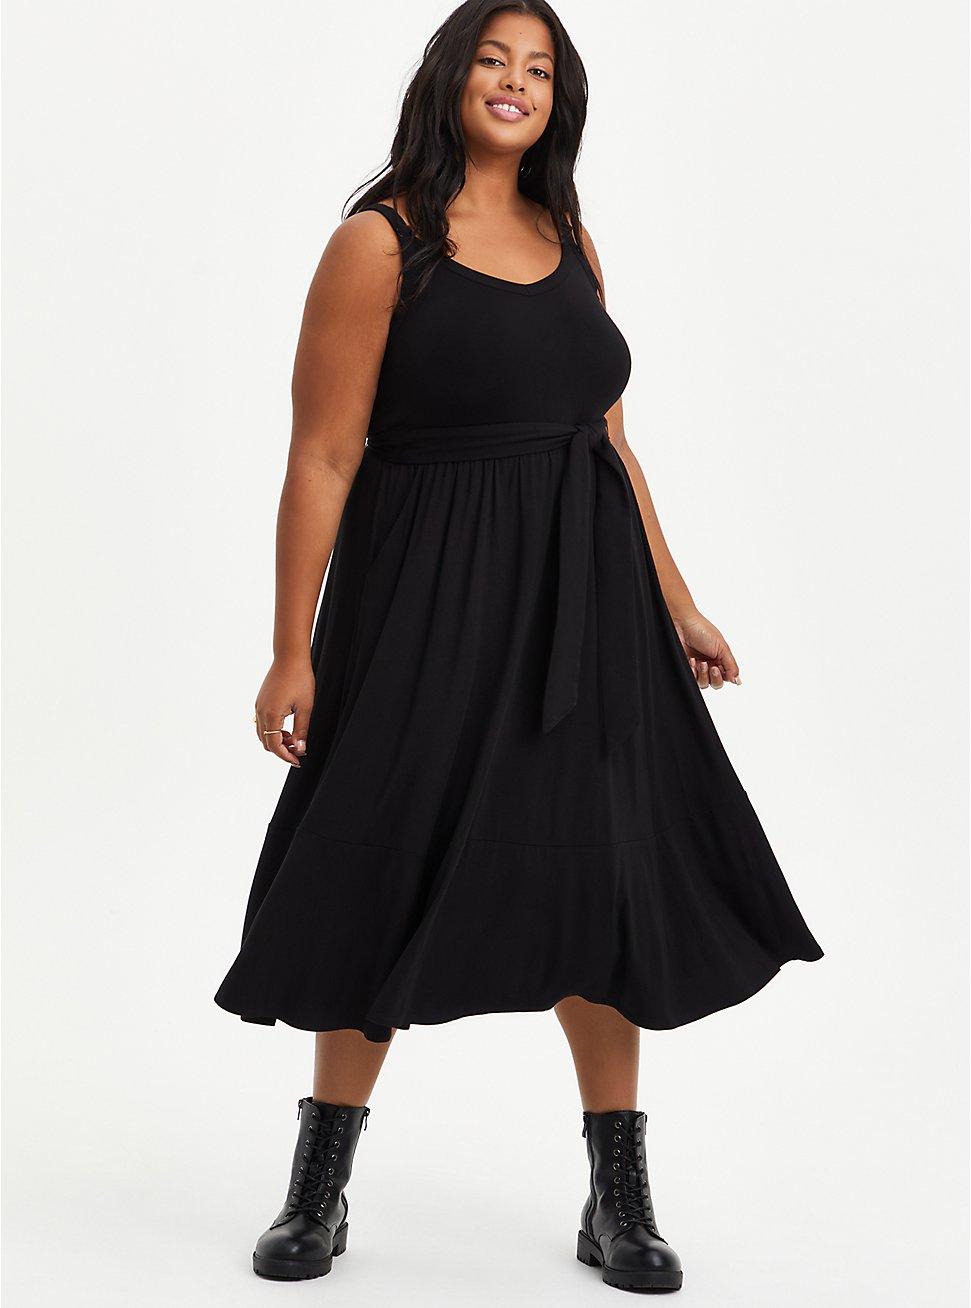 Tie Waist Midi Skater Dress - Super Soft Black, DEEP BLACK, hi-res